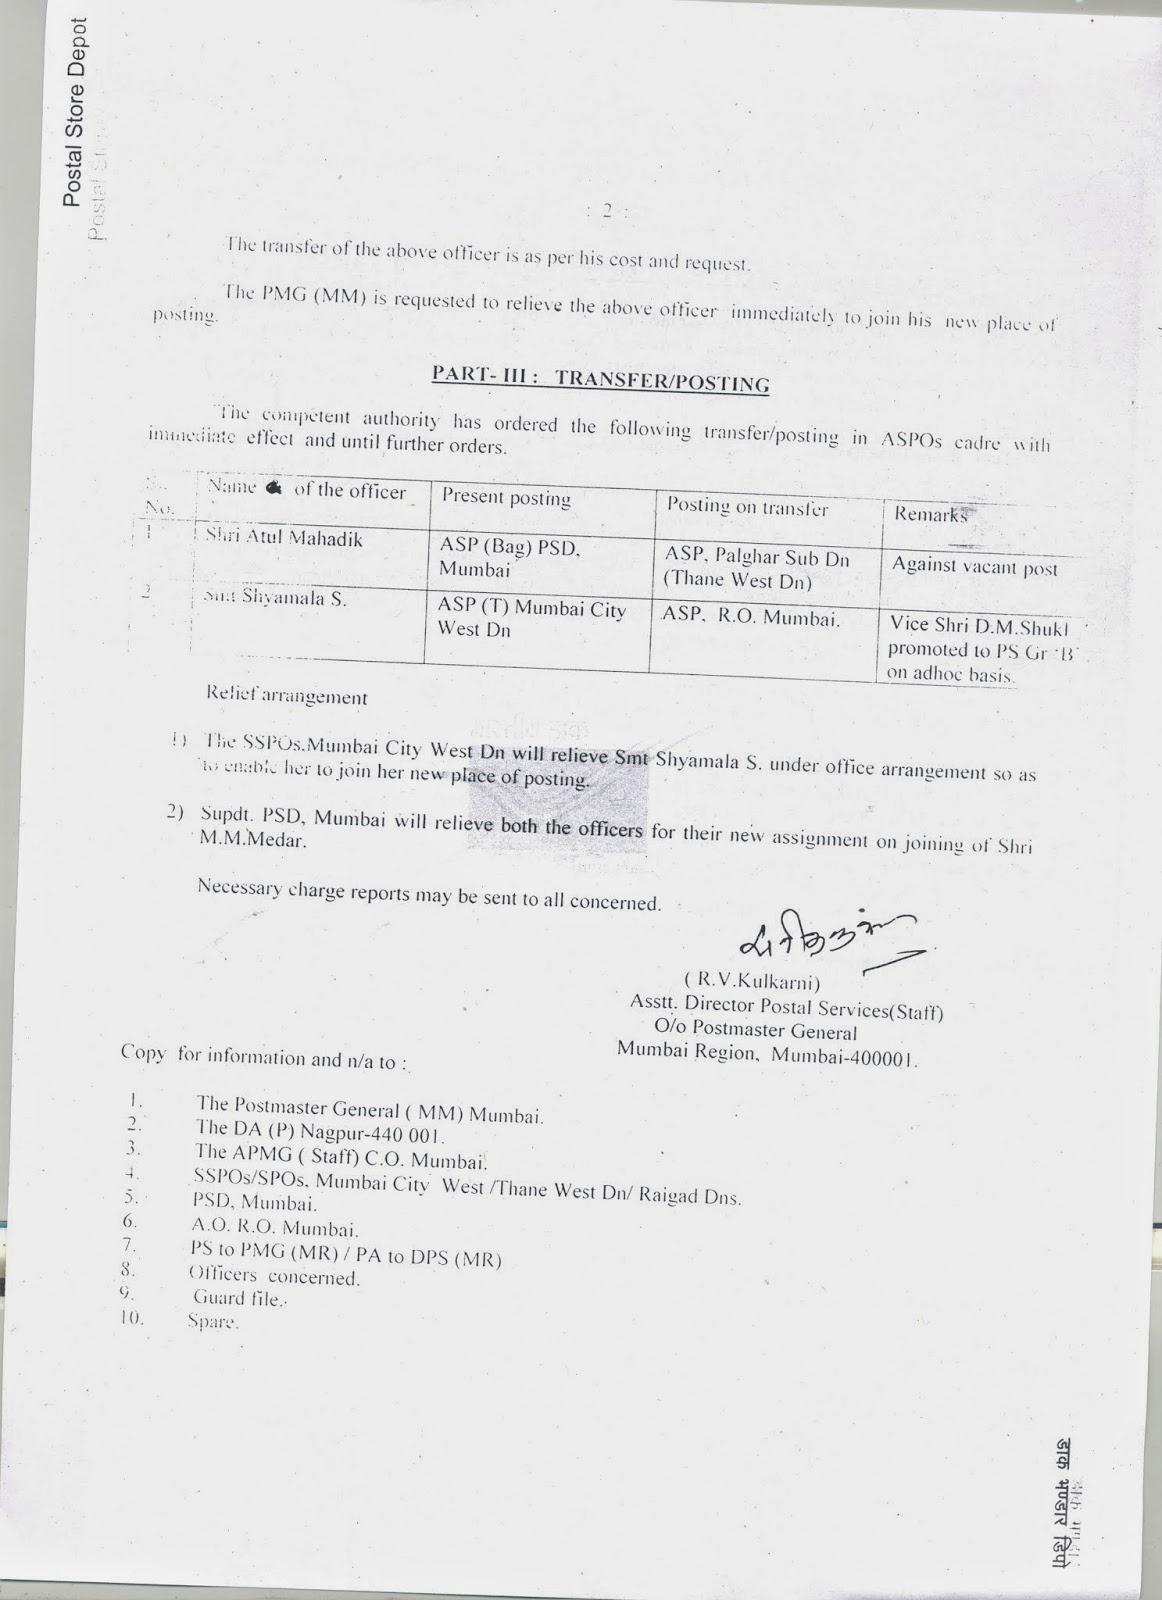 All India Association of Inspectors & Asst. Supdt. Posts